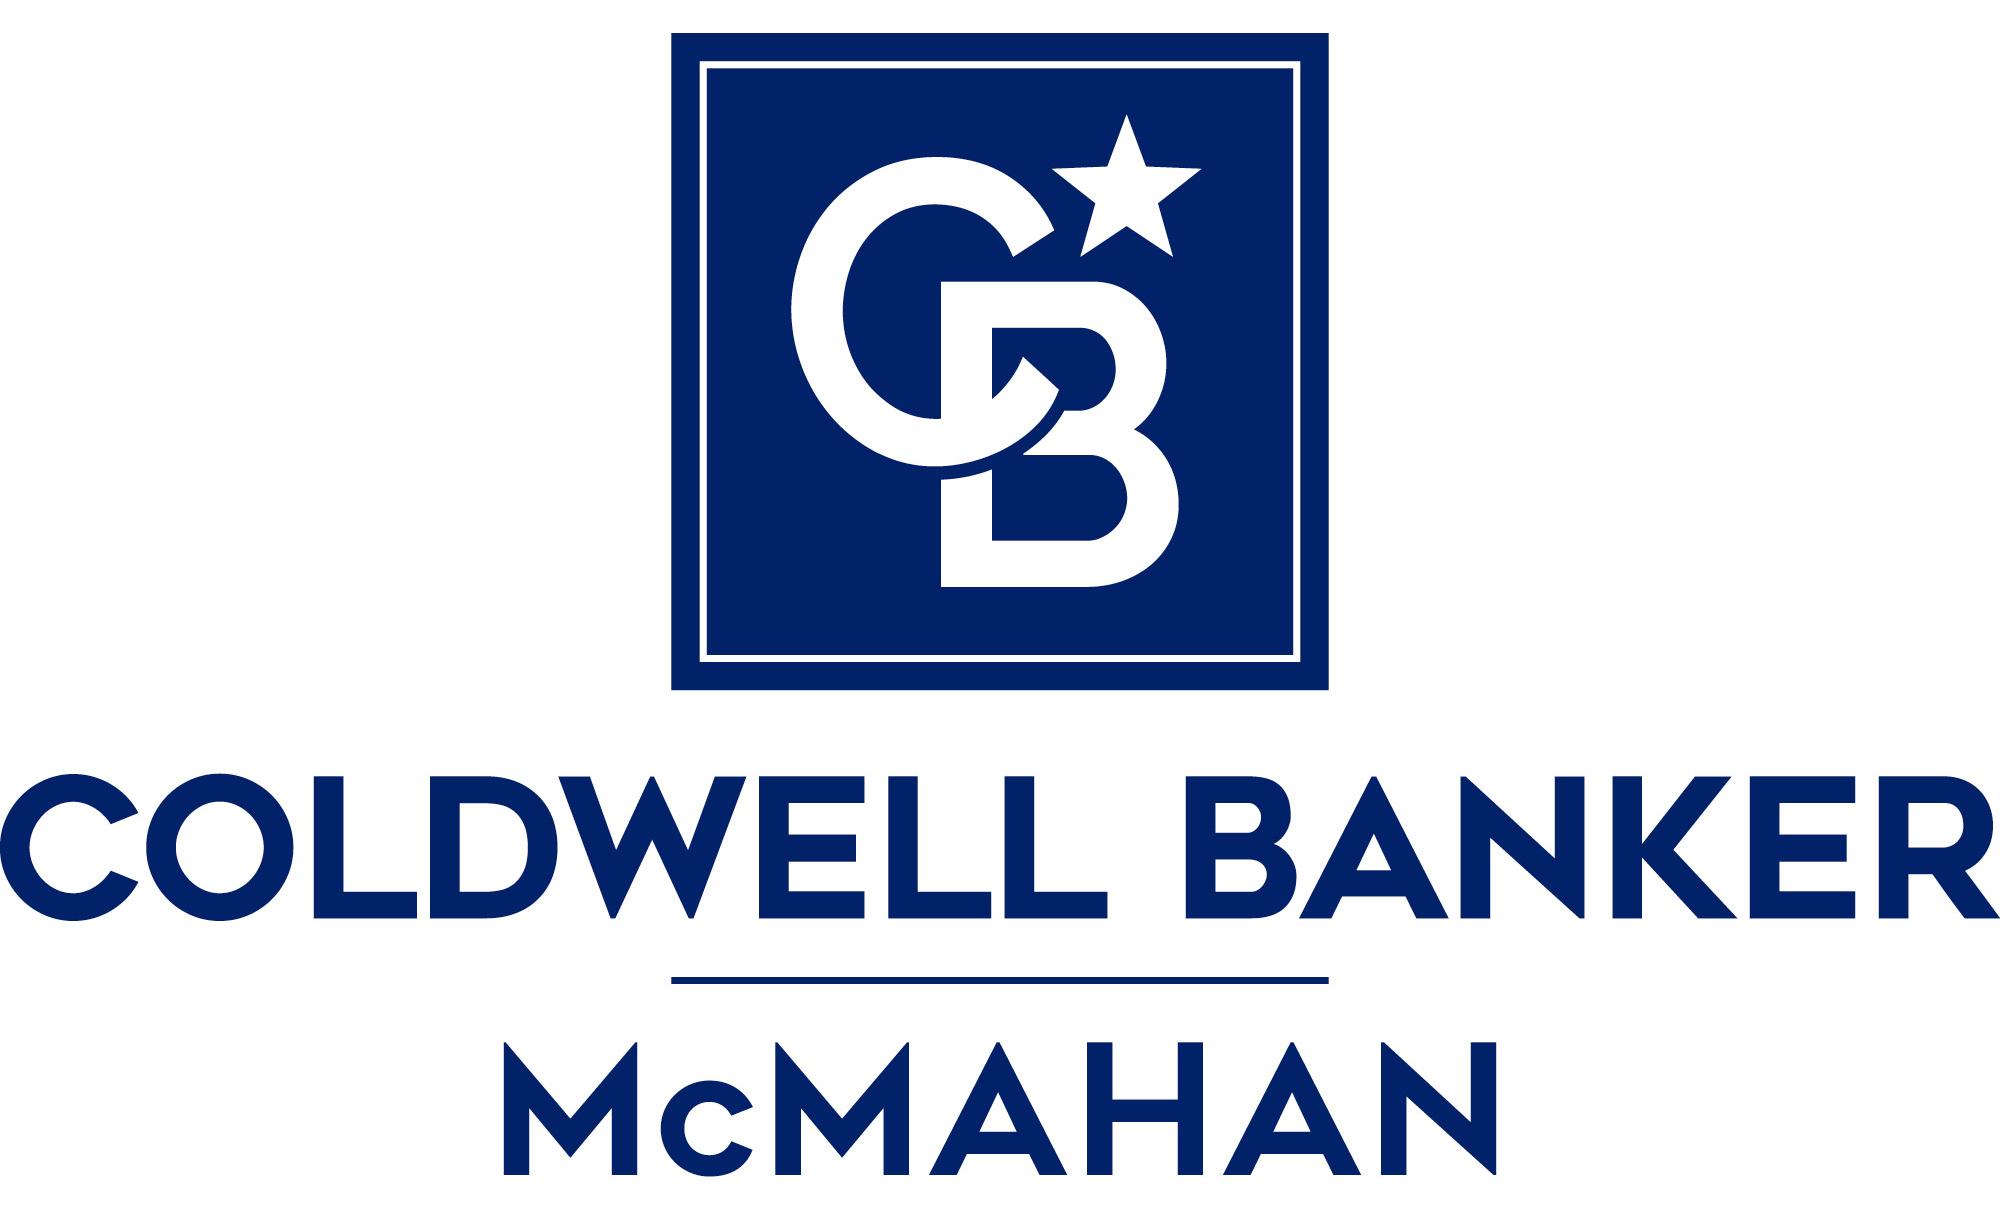 NECA HUDGINS - Coldwell Banker McMahan Logo